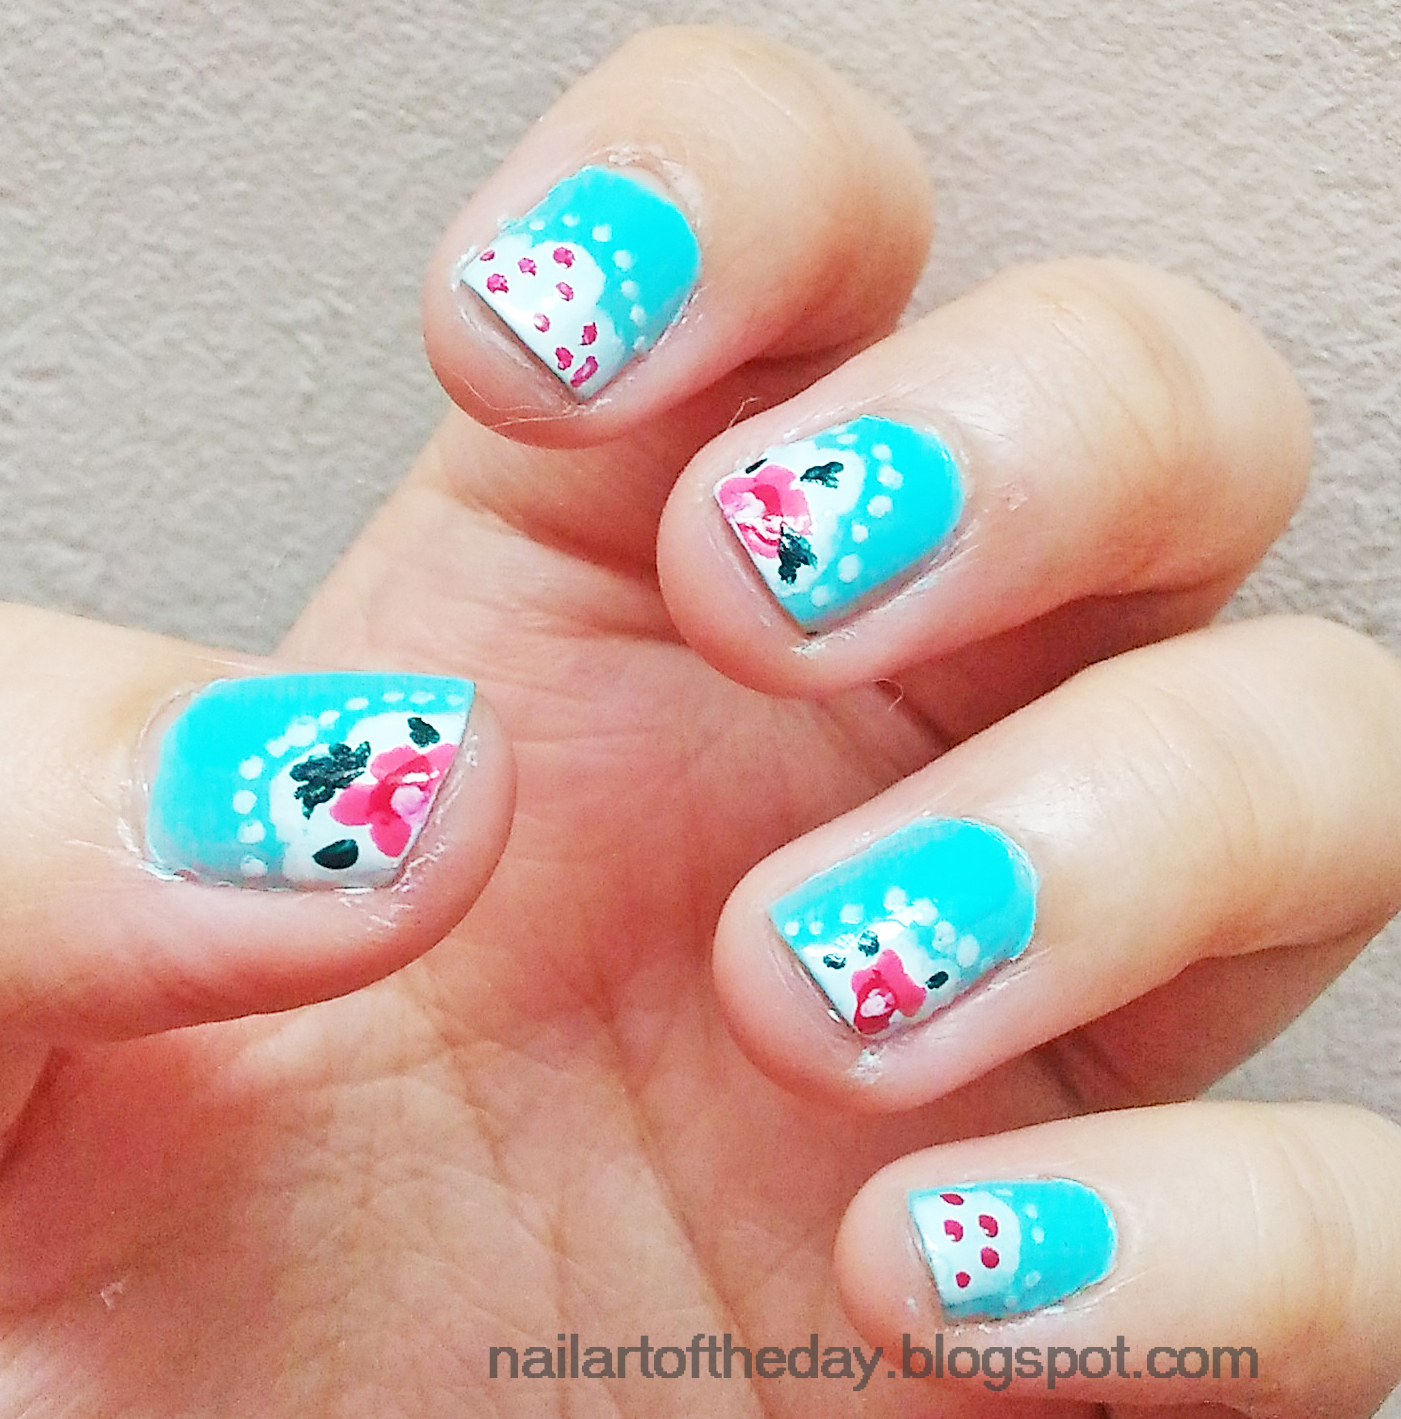 What a wonderful world shabby chic blue nail art - Nail art chic ...